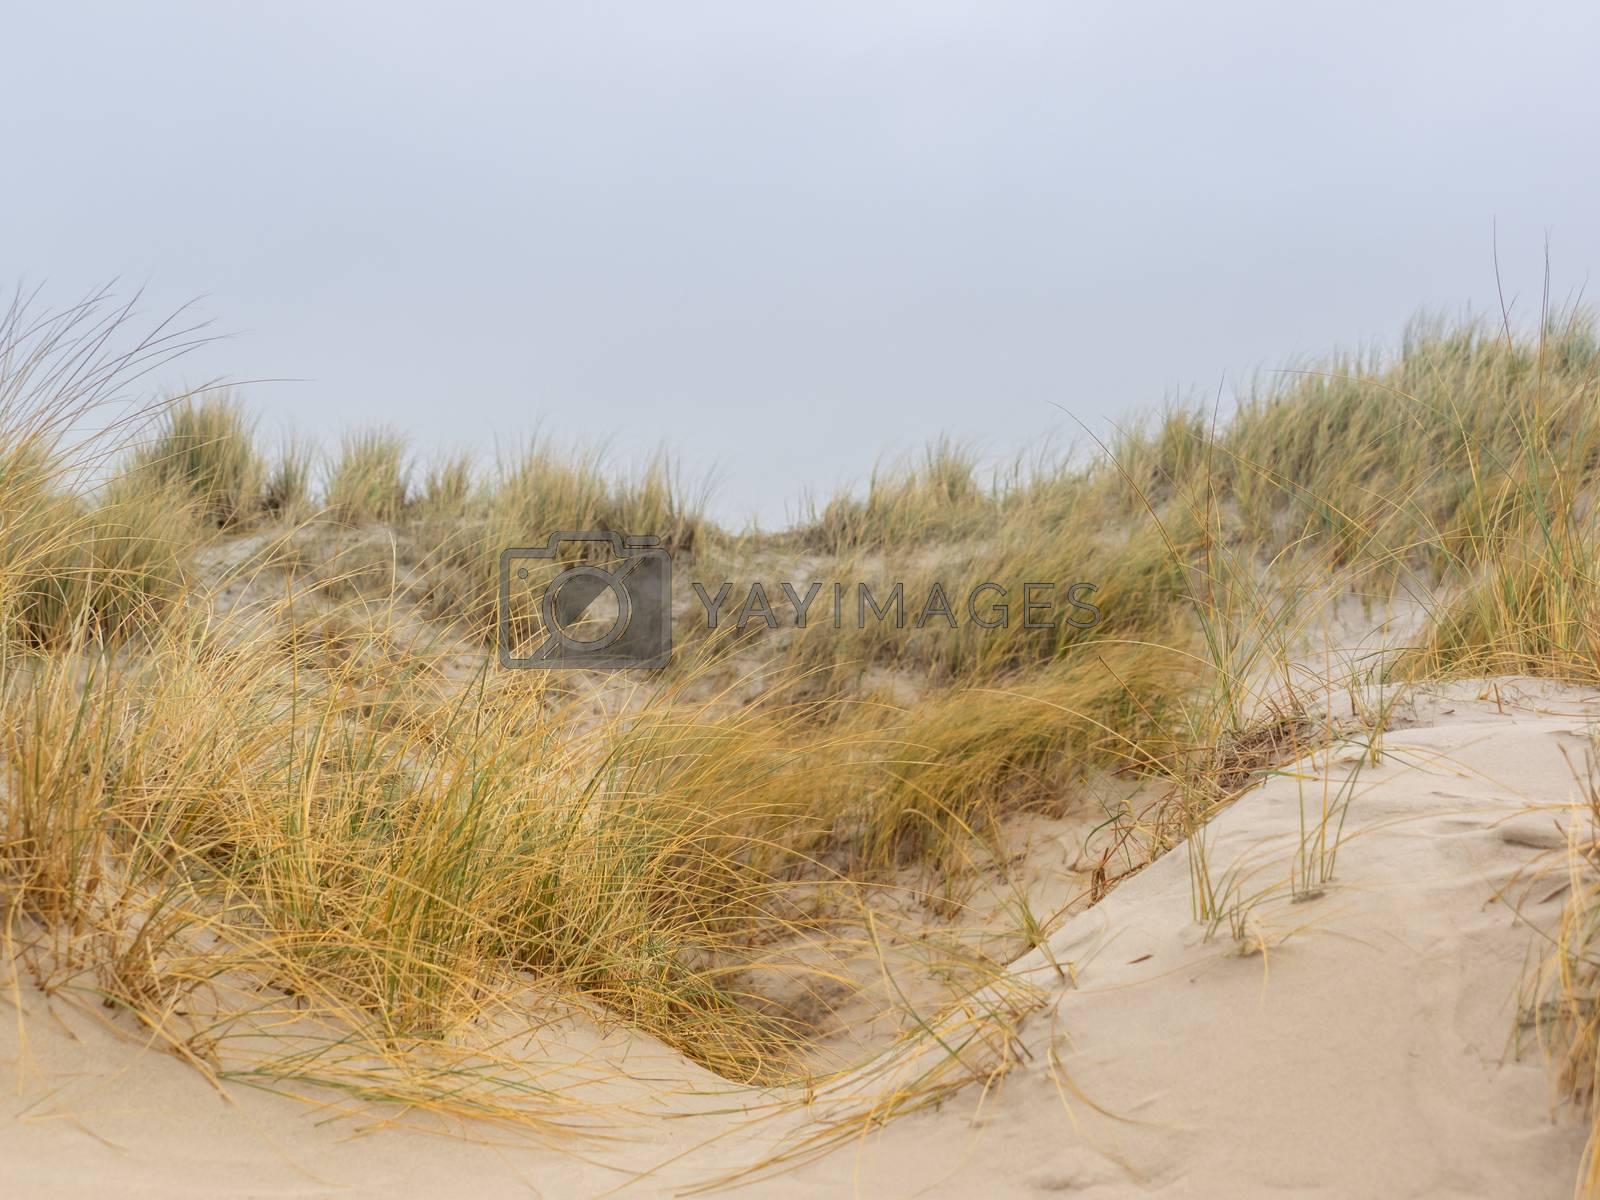 Dune landscape on the island Helgoland by Sandra Fotodesign